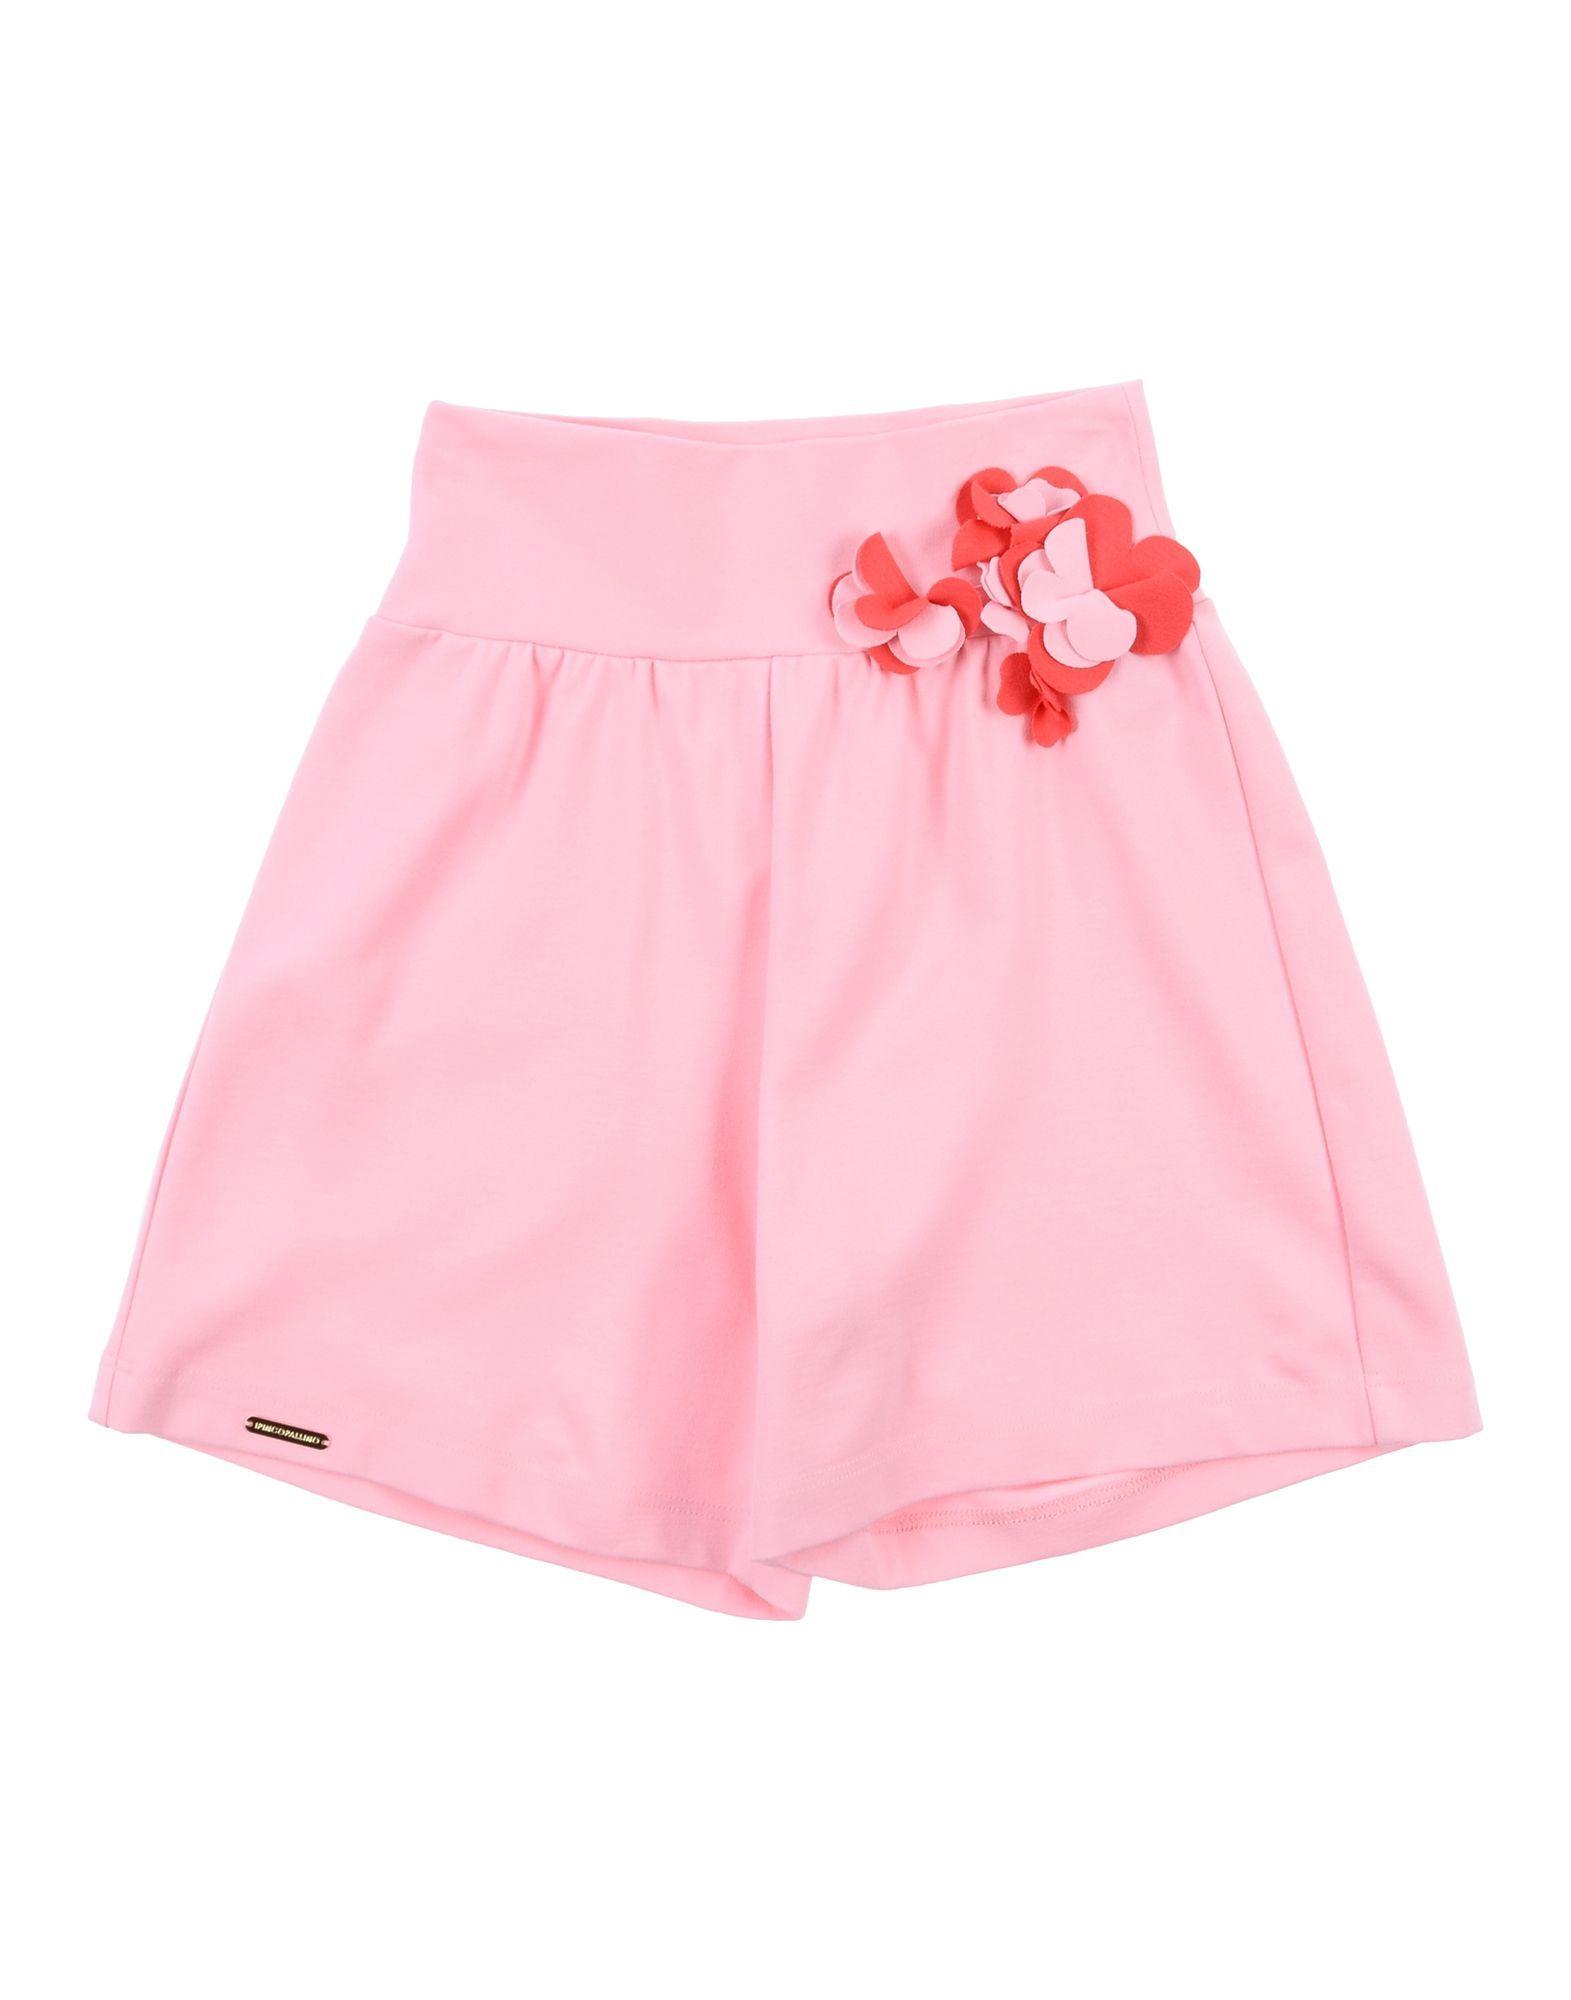 I Pinco Pallino Pink Girls Shorts